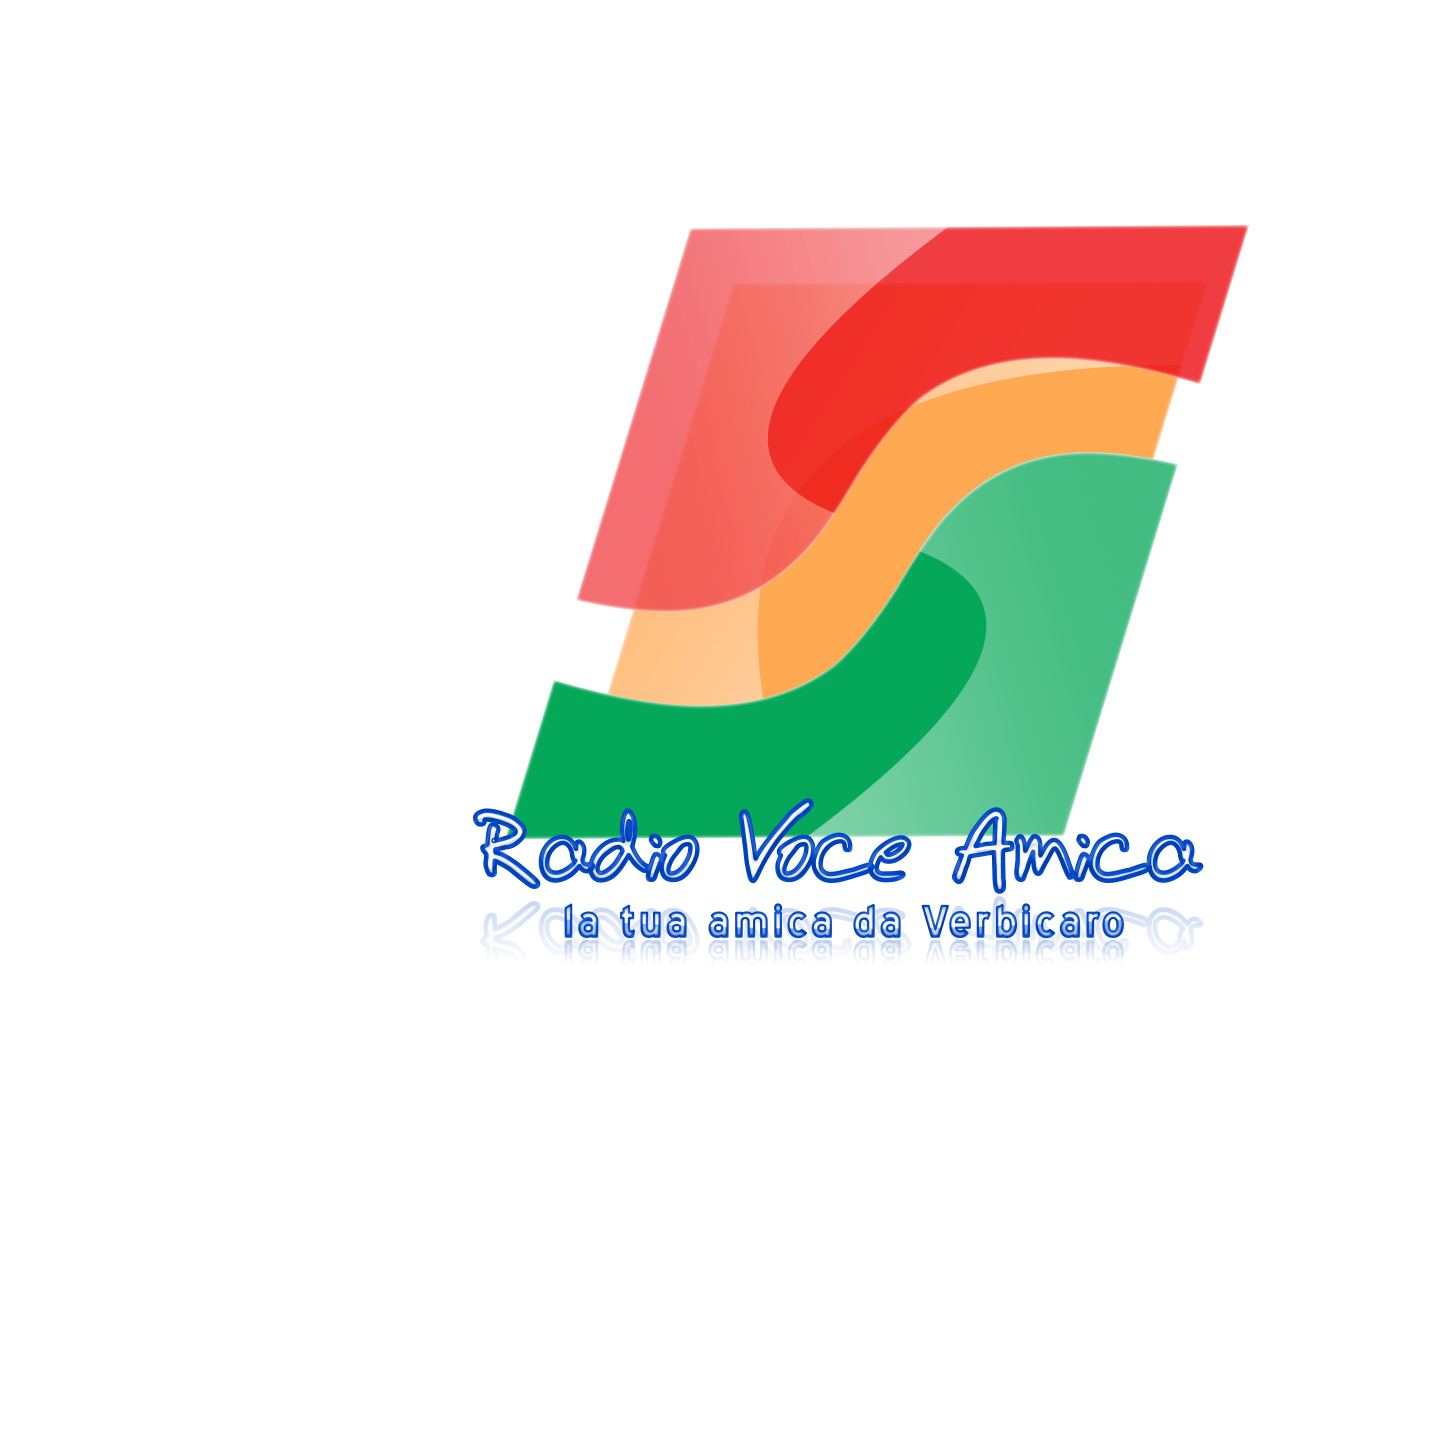 RadioVoceAmica